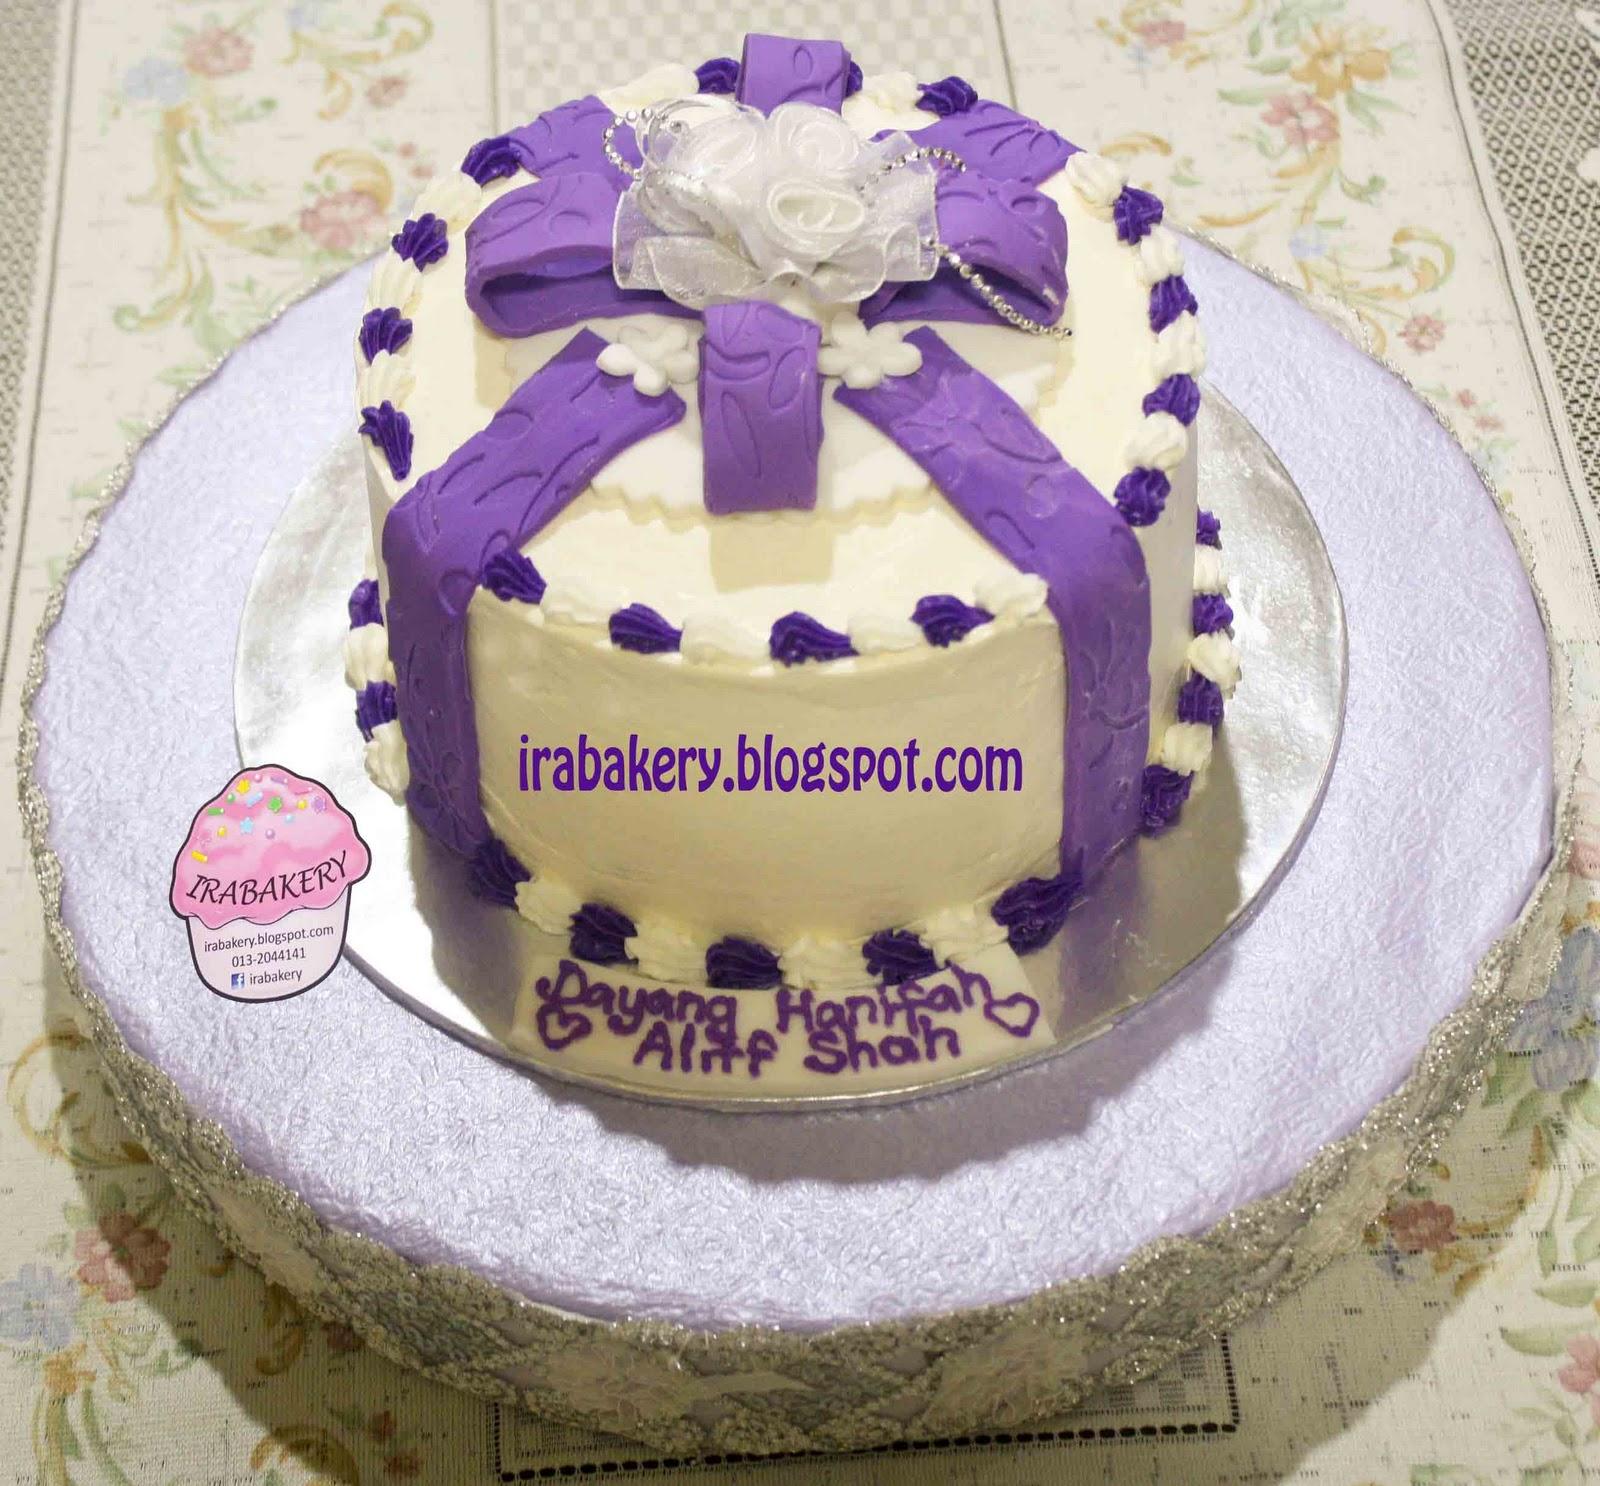 Deco Cakes Cupcakes Cheese cake & Kek Lapis Sarawak in